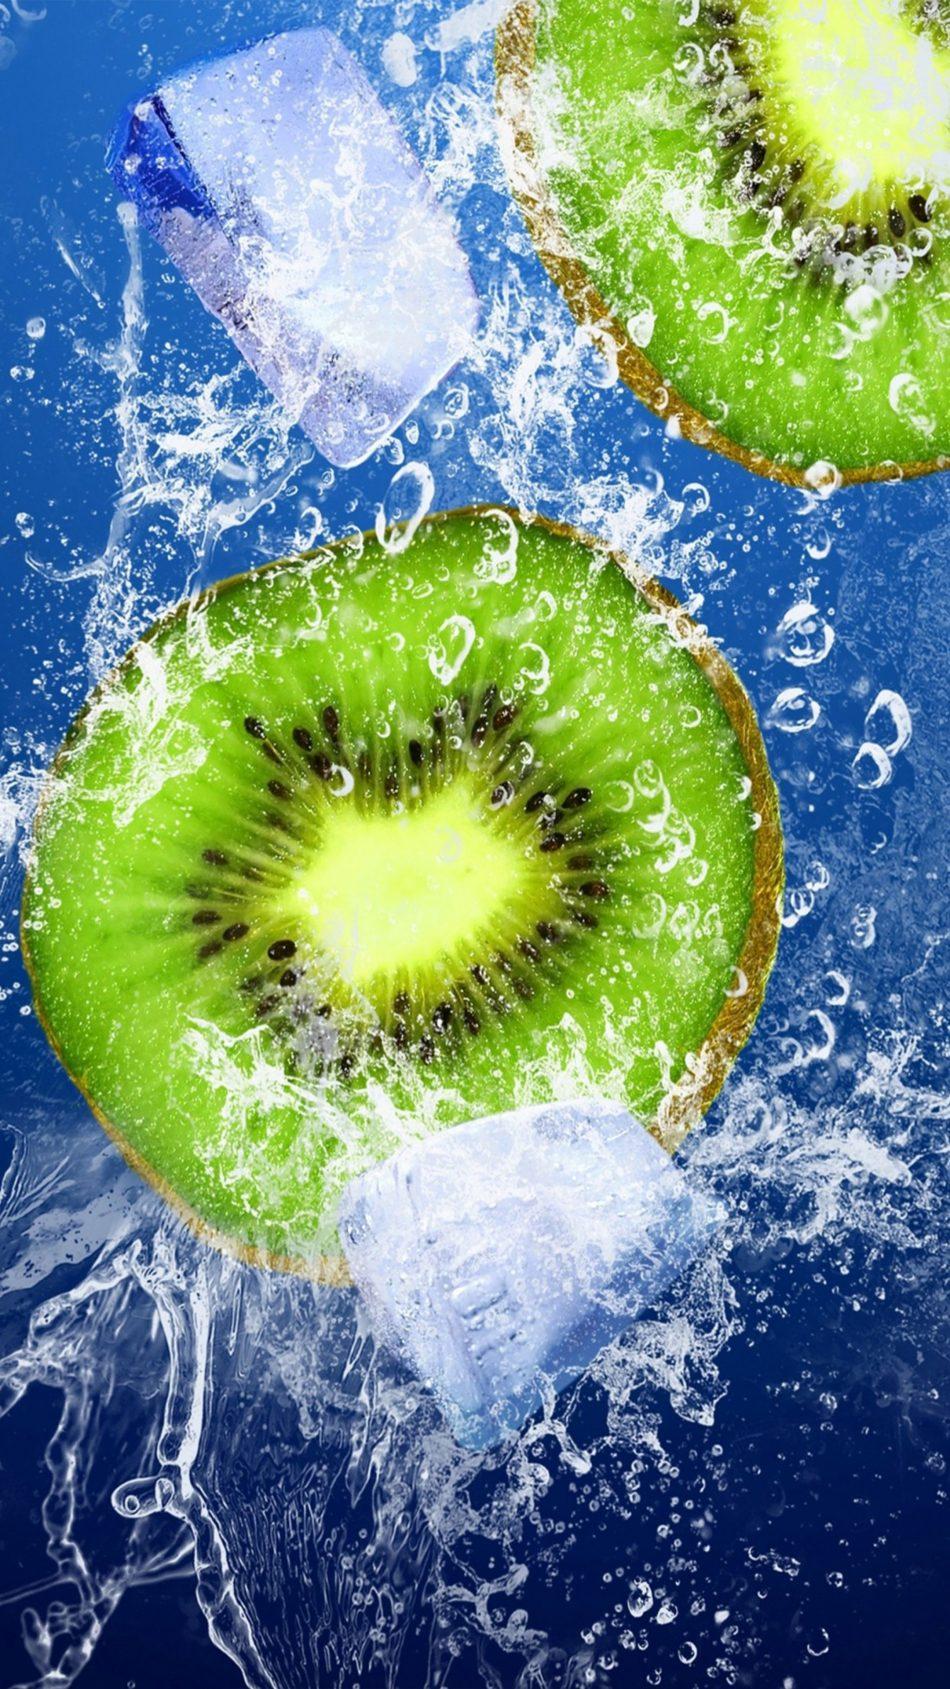 Download Kiwi Ice Underwater Free Pure 4k Ultra Hd Mobile Wallpaper